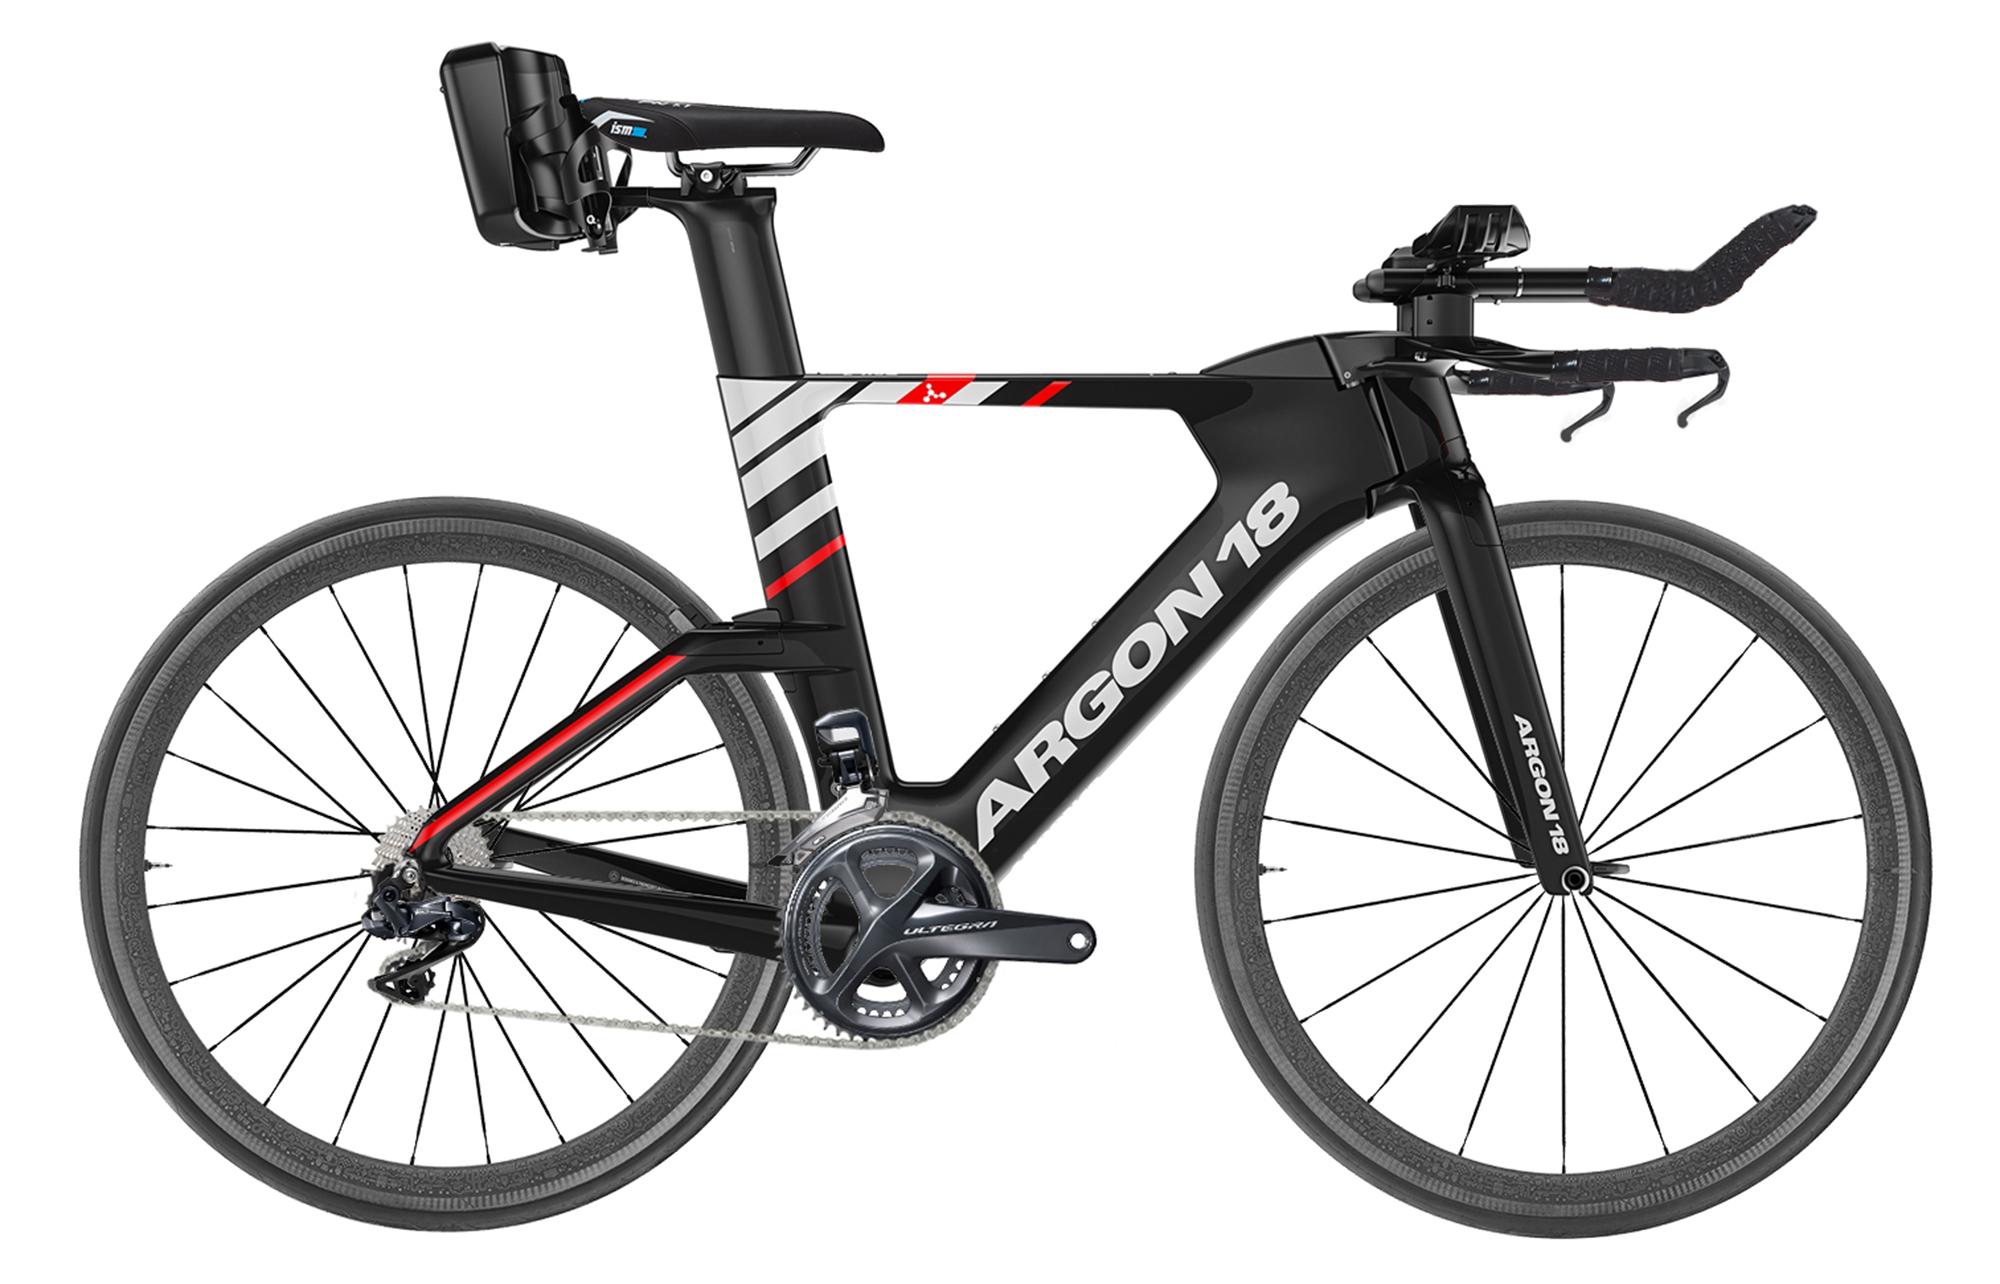 bc4a336b6f2 Argon 18 E-119 Tri+ Ultegra Di2 Bike | R&A Cycles